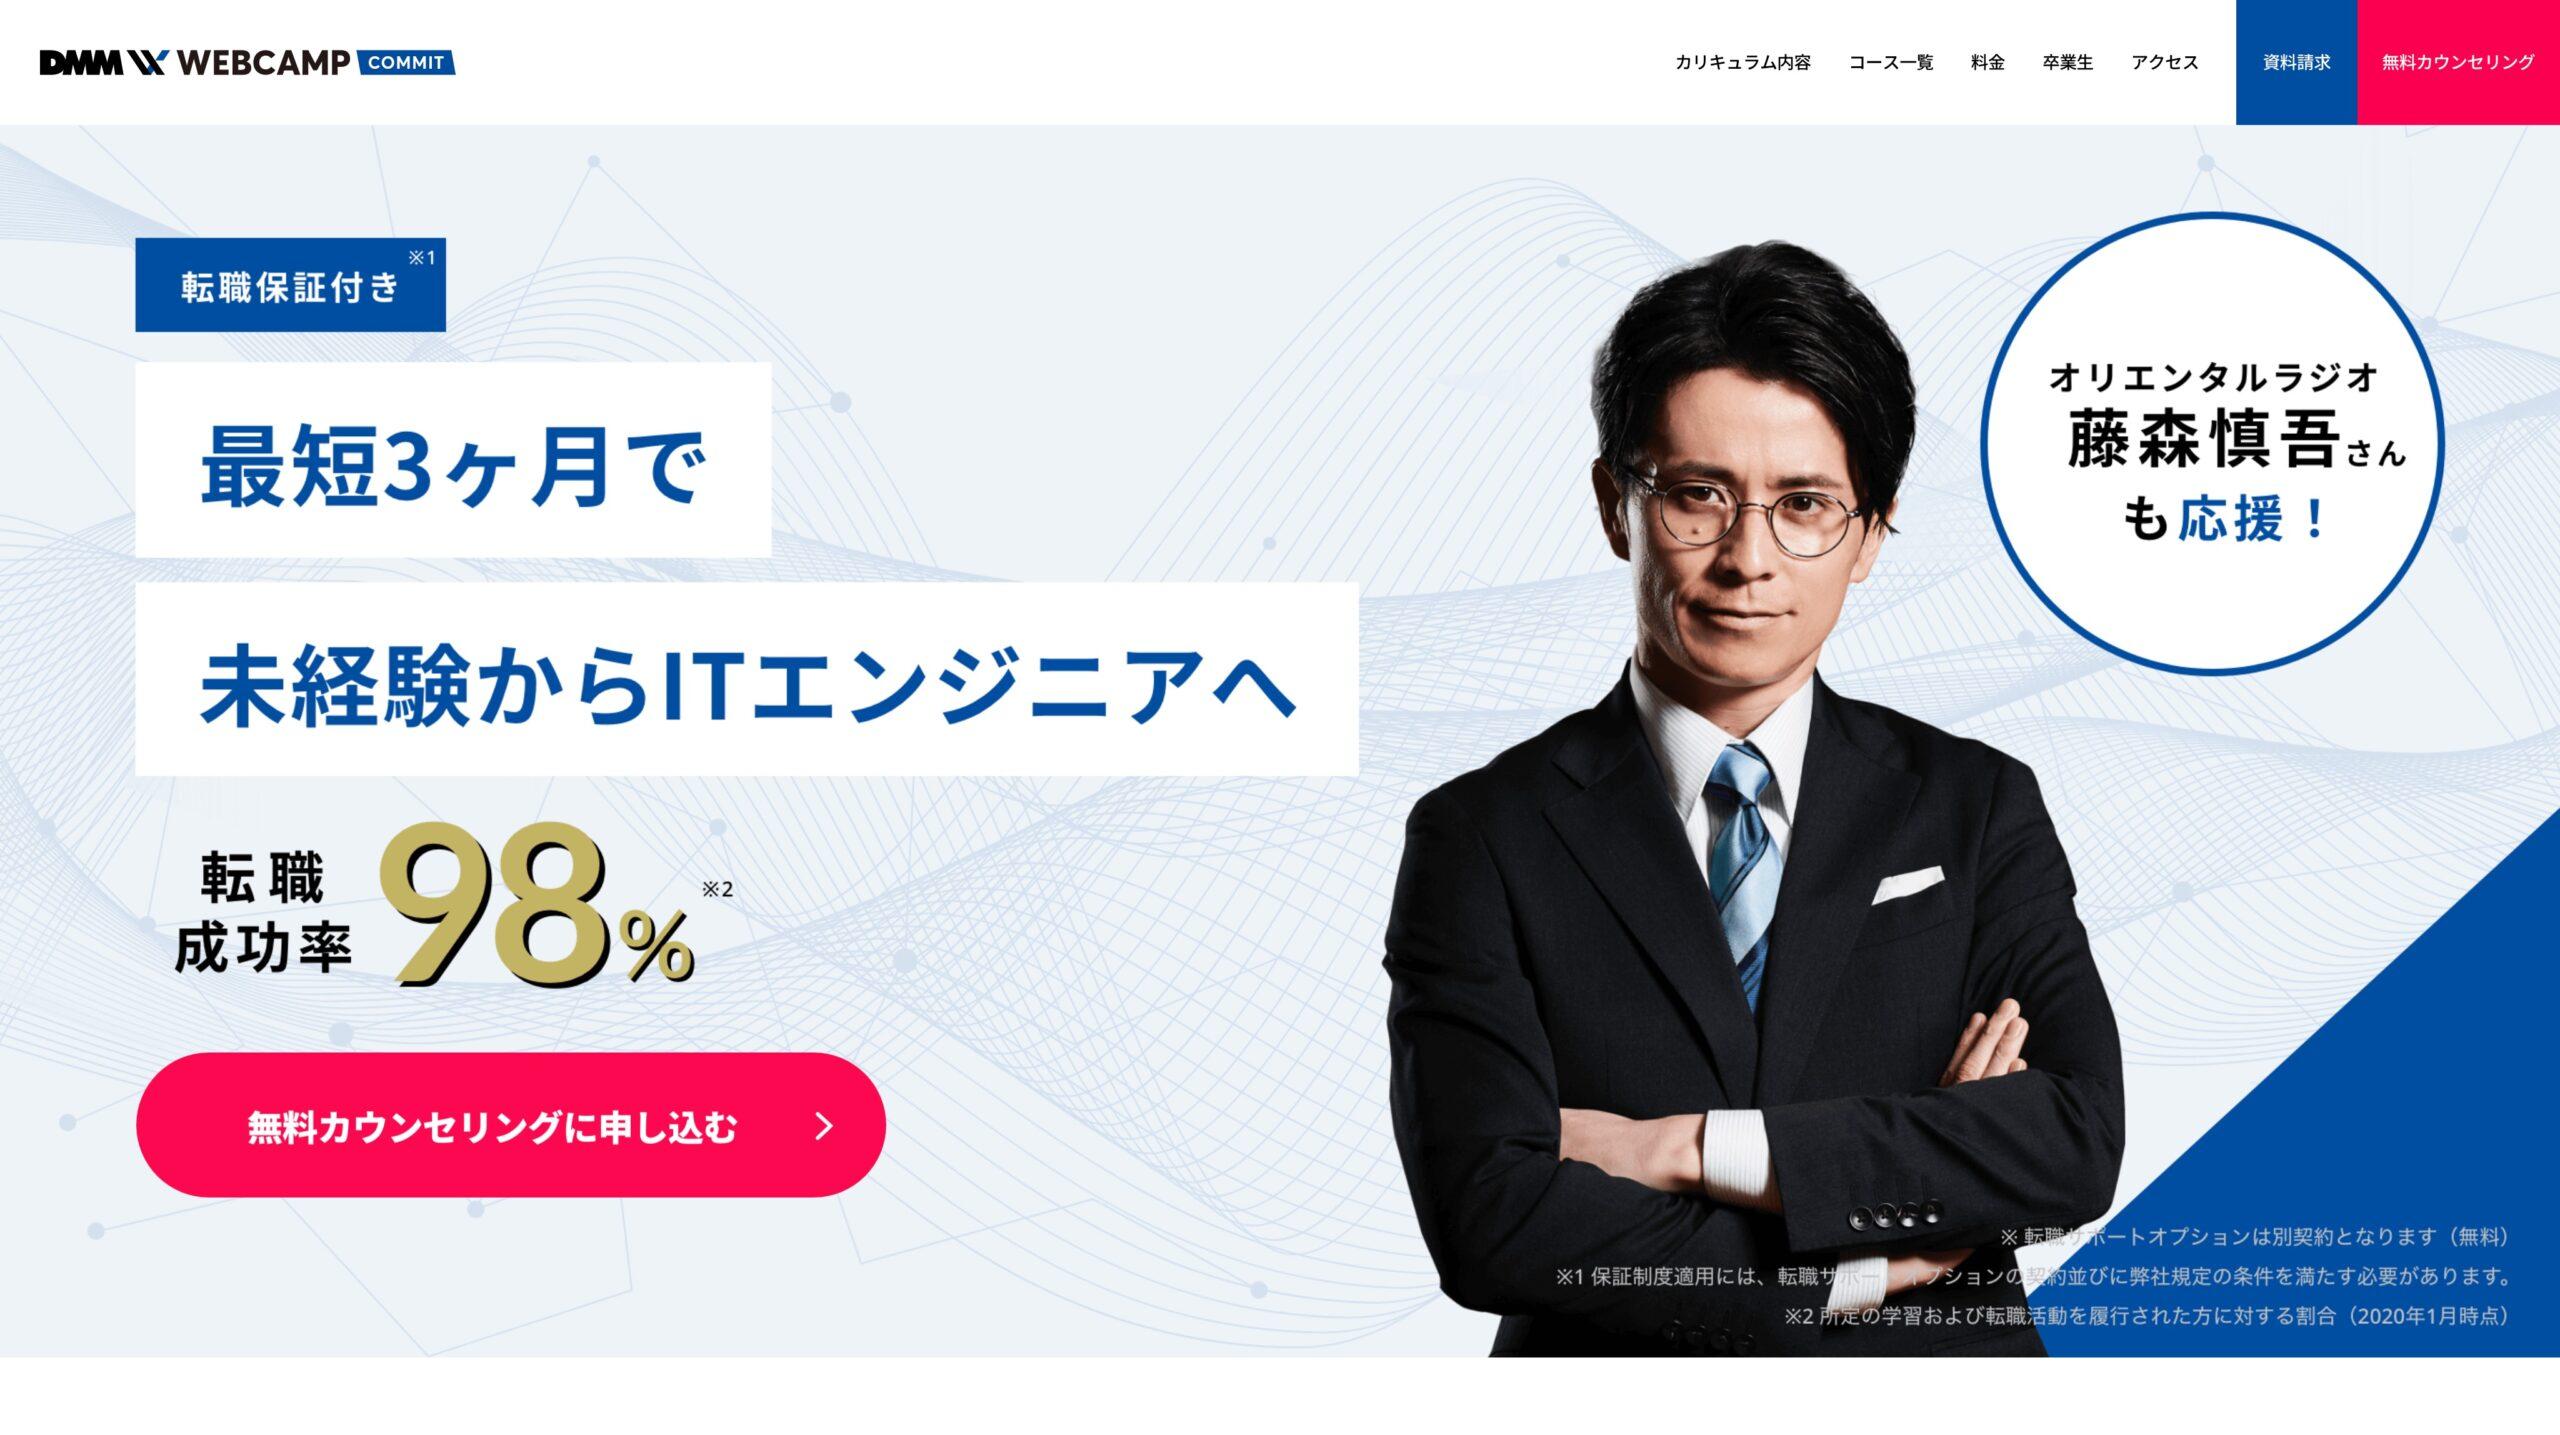 DMM WEBCAMP COMMIT公式サイト